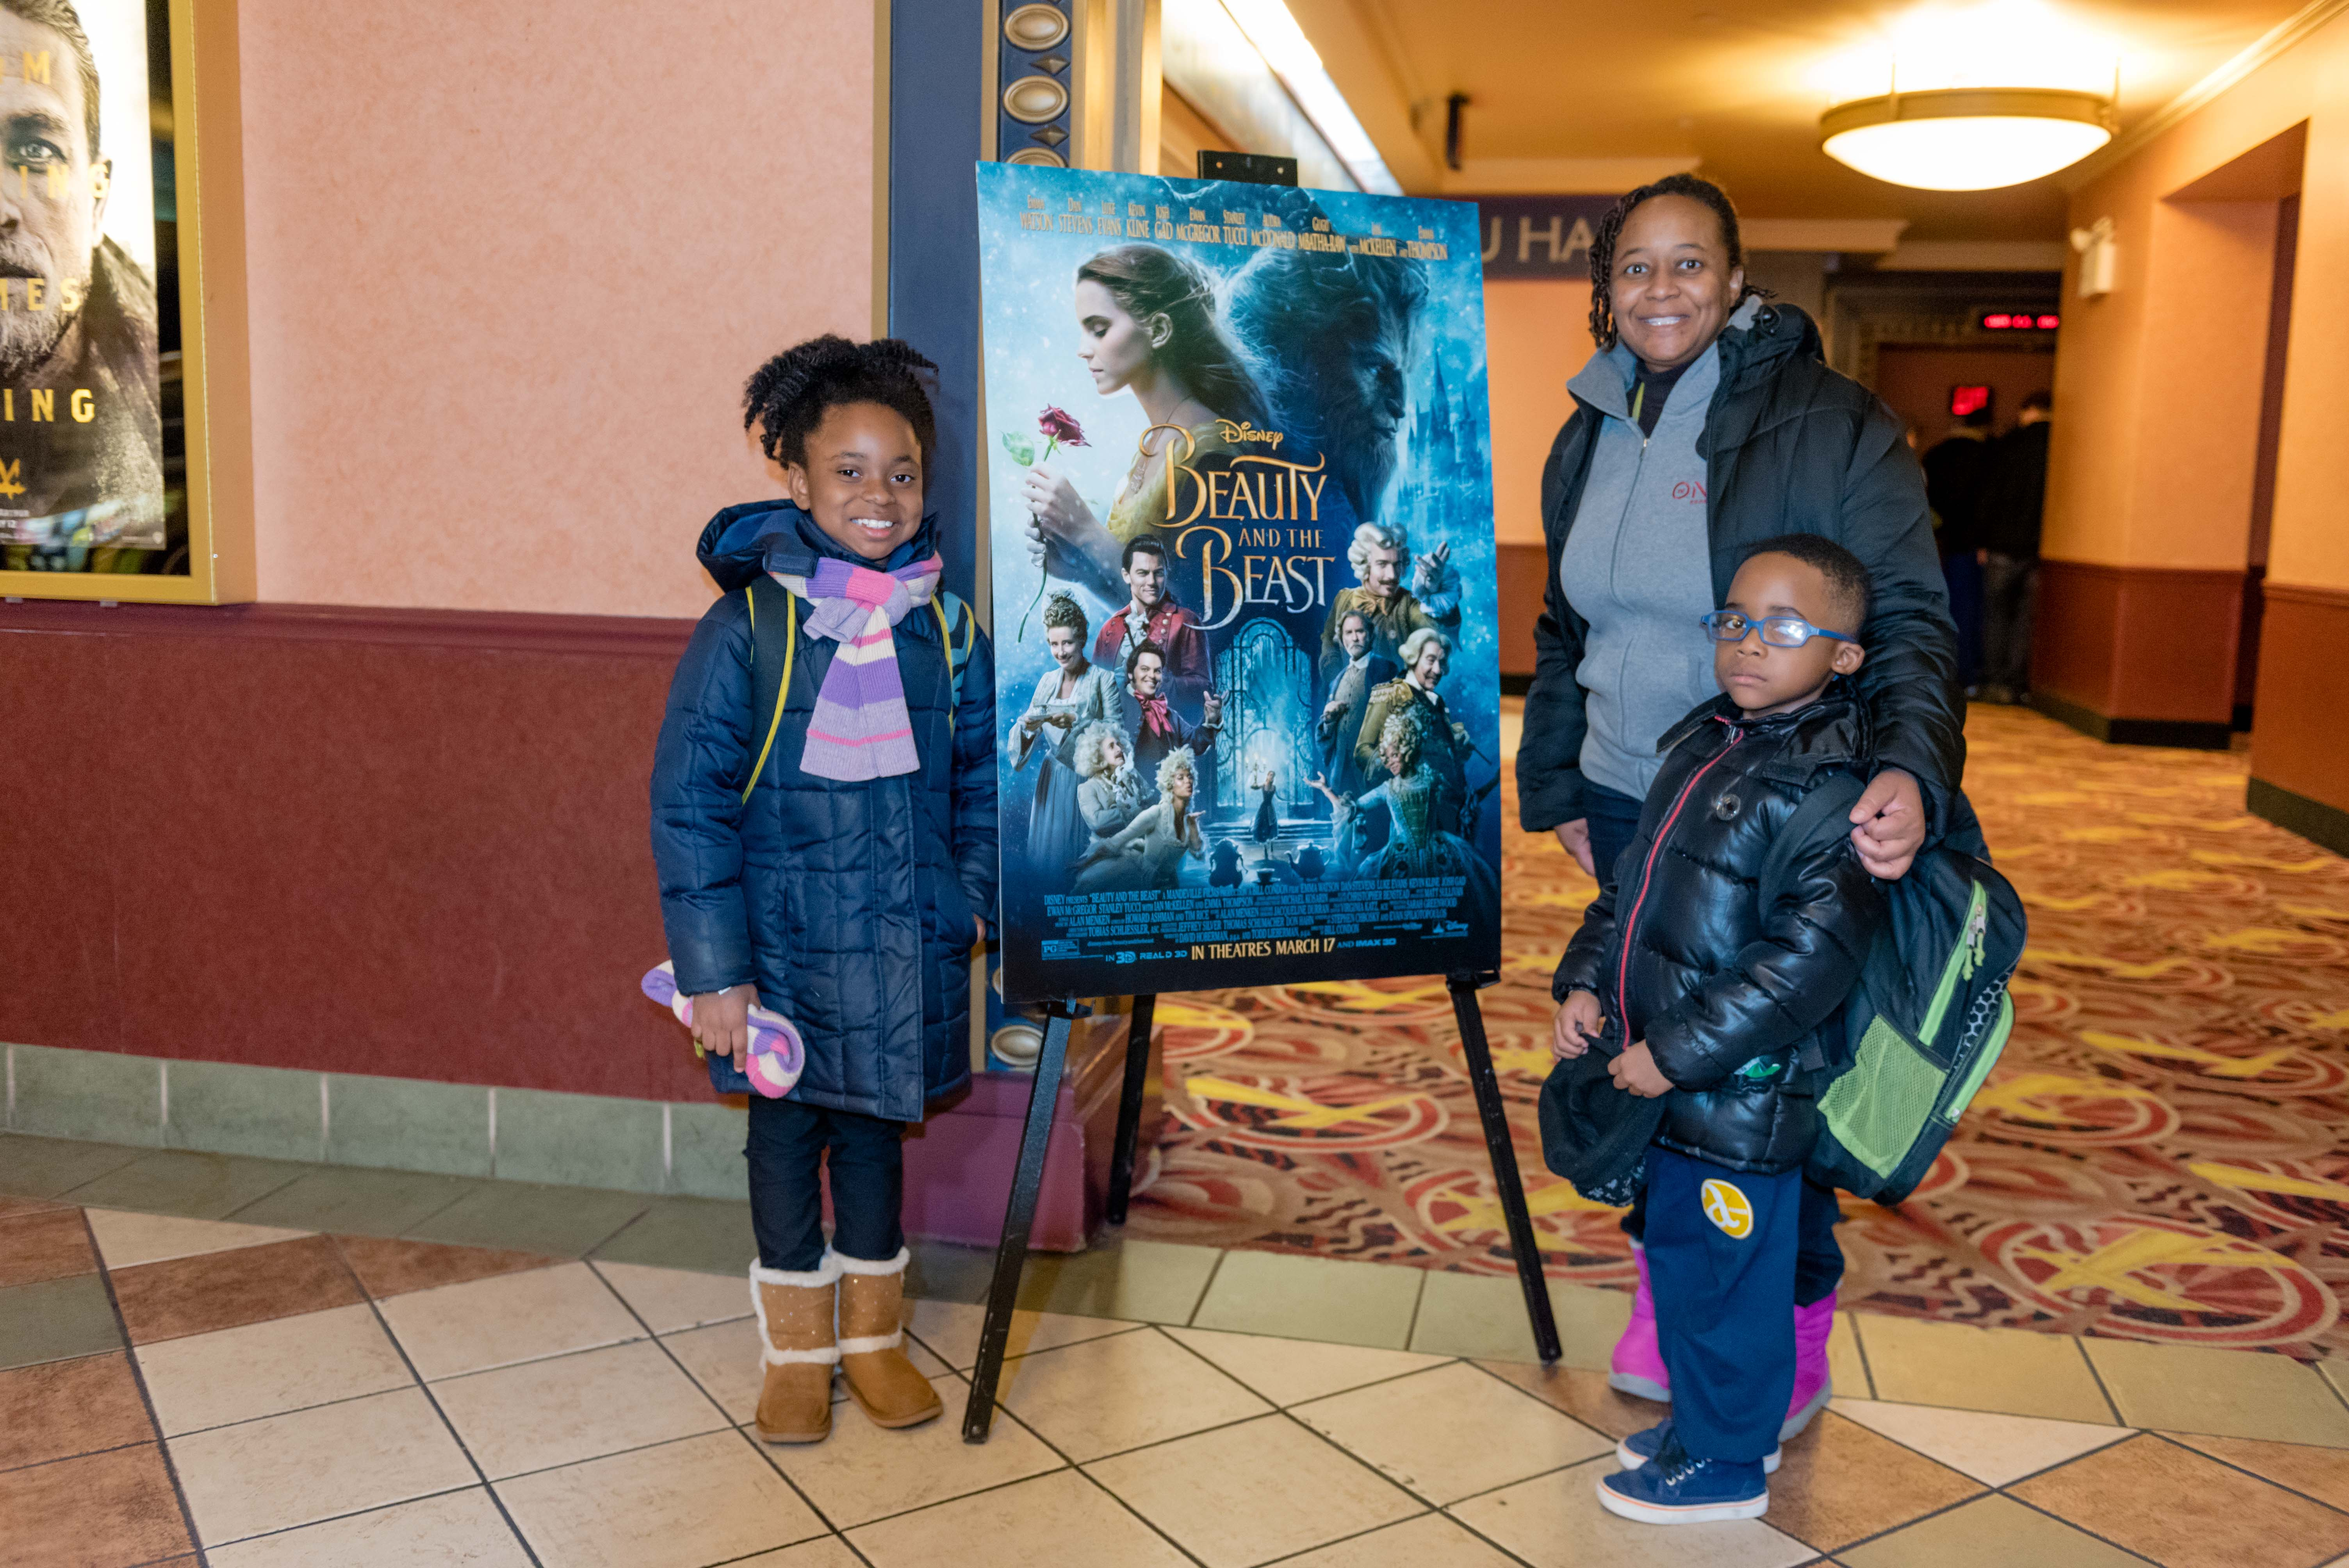 'Beauty & The Beast' Screening